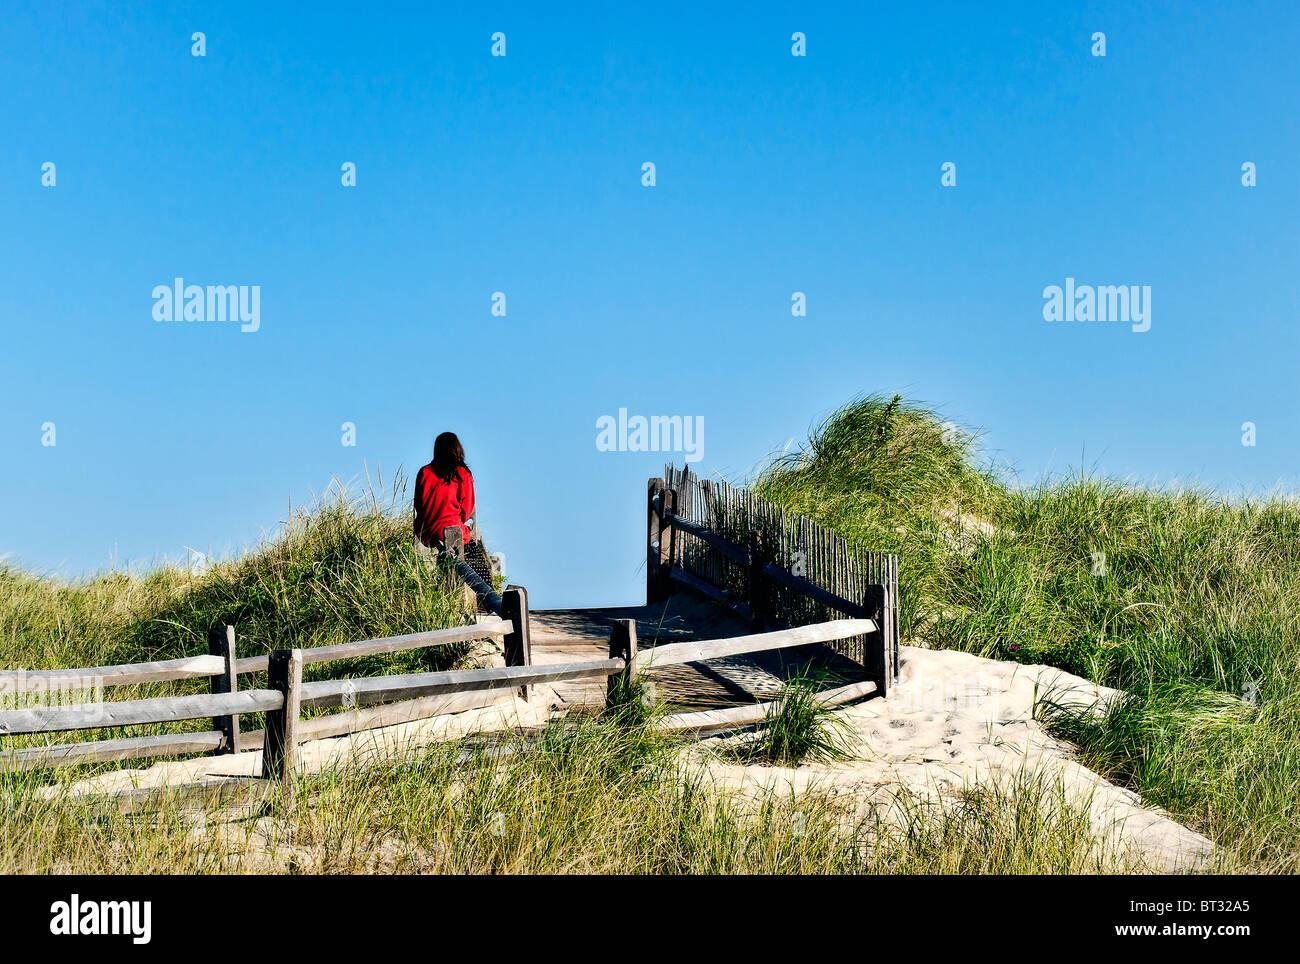 Woman enjoys dune view of the ocean. - Stock Image